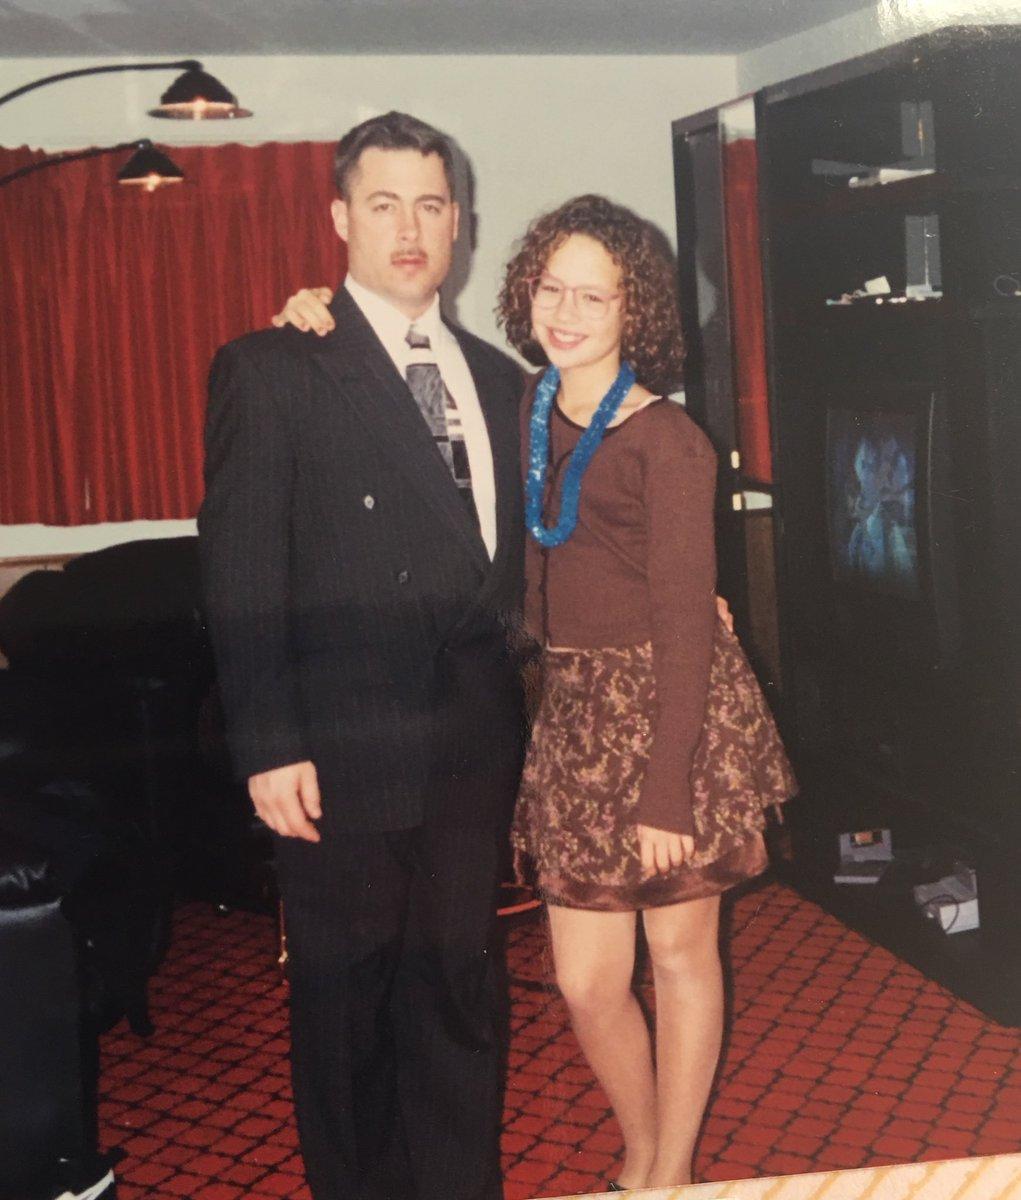 #tbt my dad and I 🤓 I was 12 years old 😂 cwzTQXZfOS